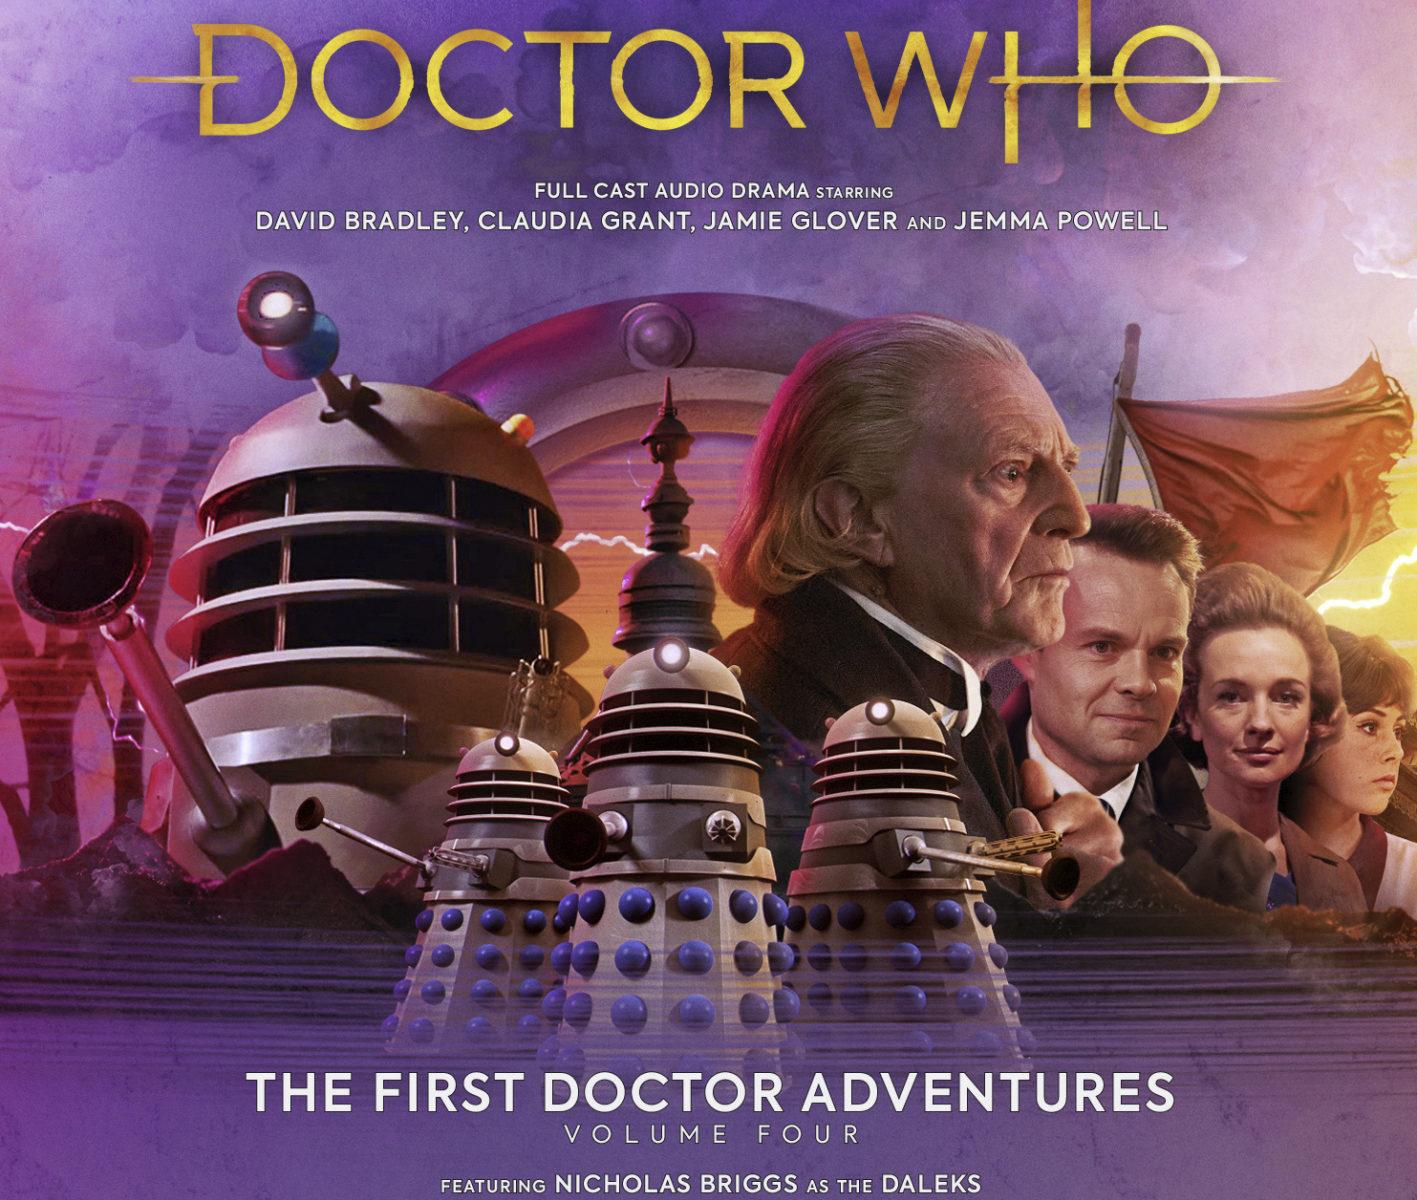 Doctor Who David Bradley battles the Daleks on Skaro